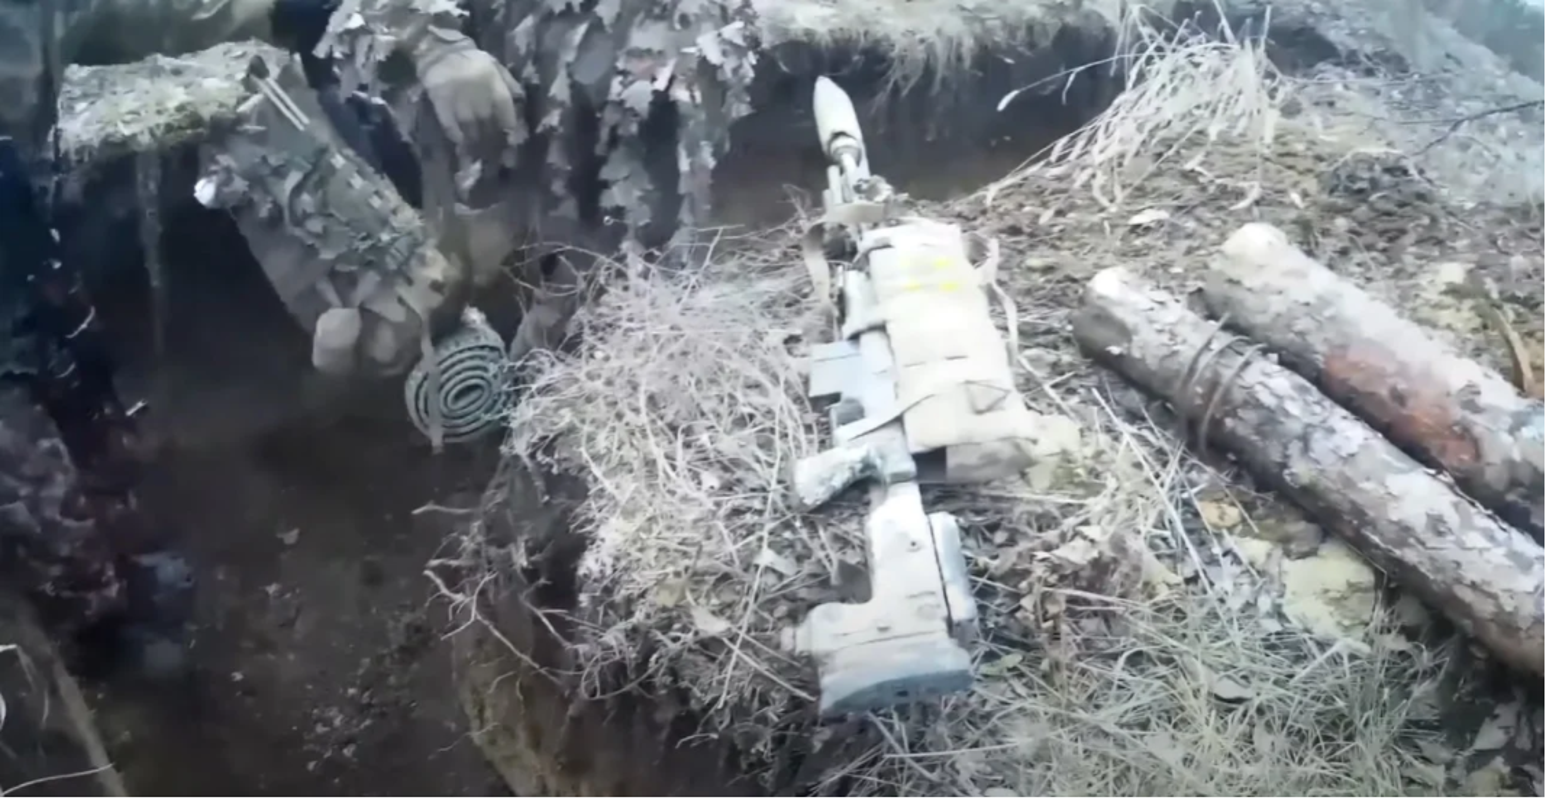 Linh Ukranie khong so xe tang Nga, ma so nhat linh ban tia-Hinh-11